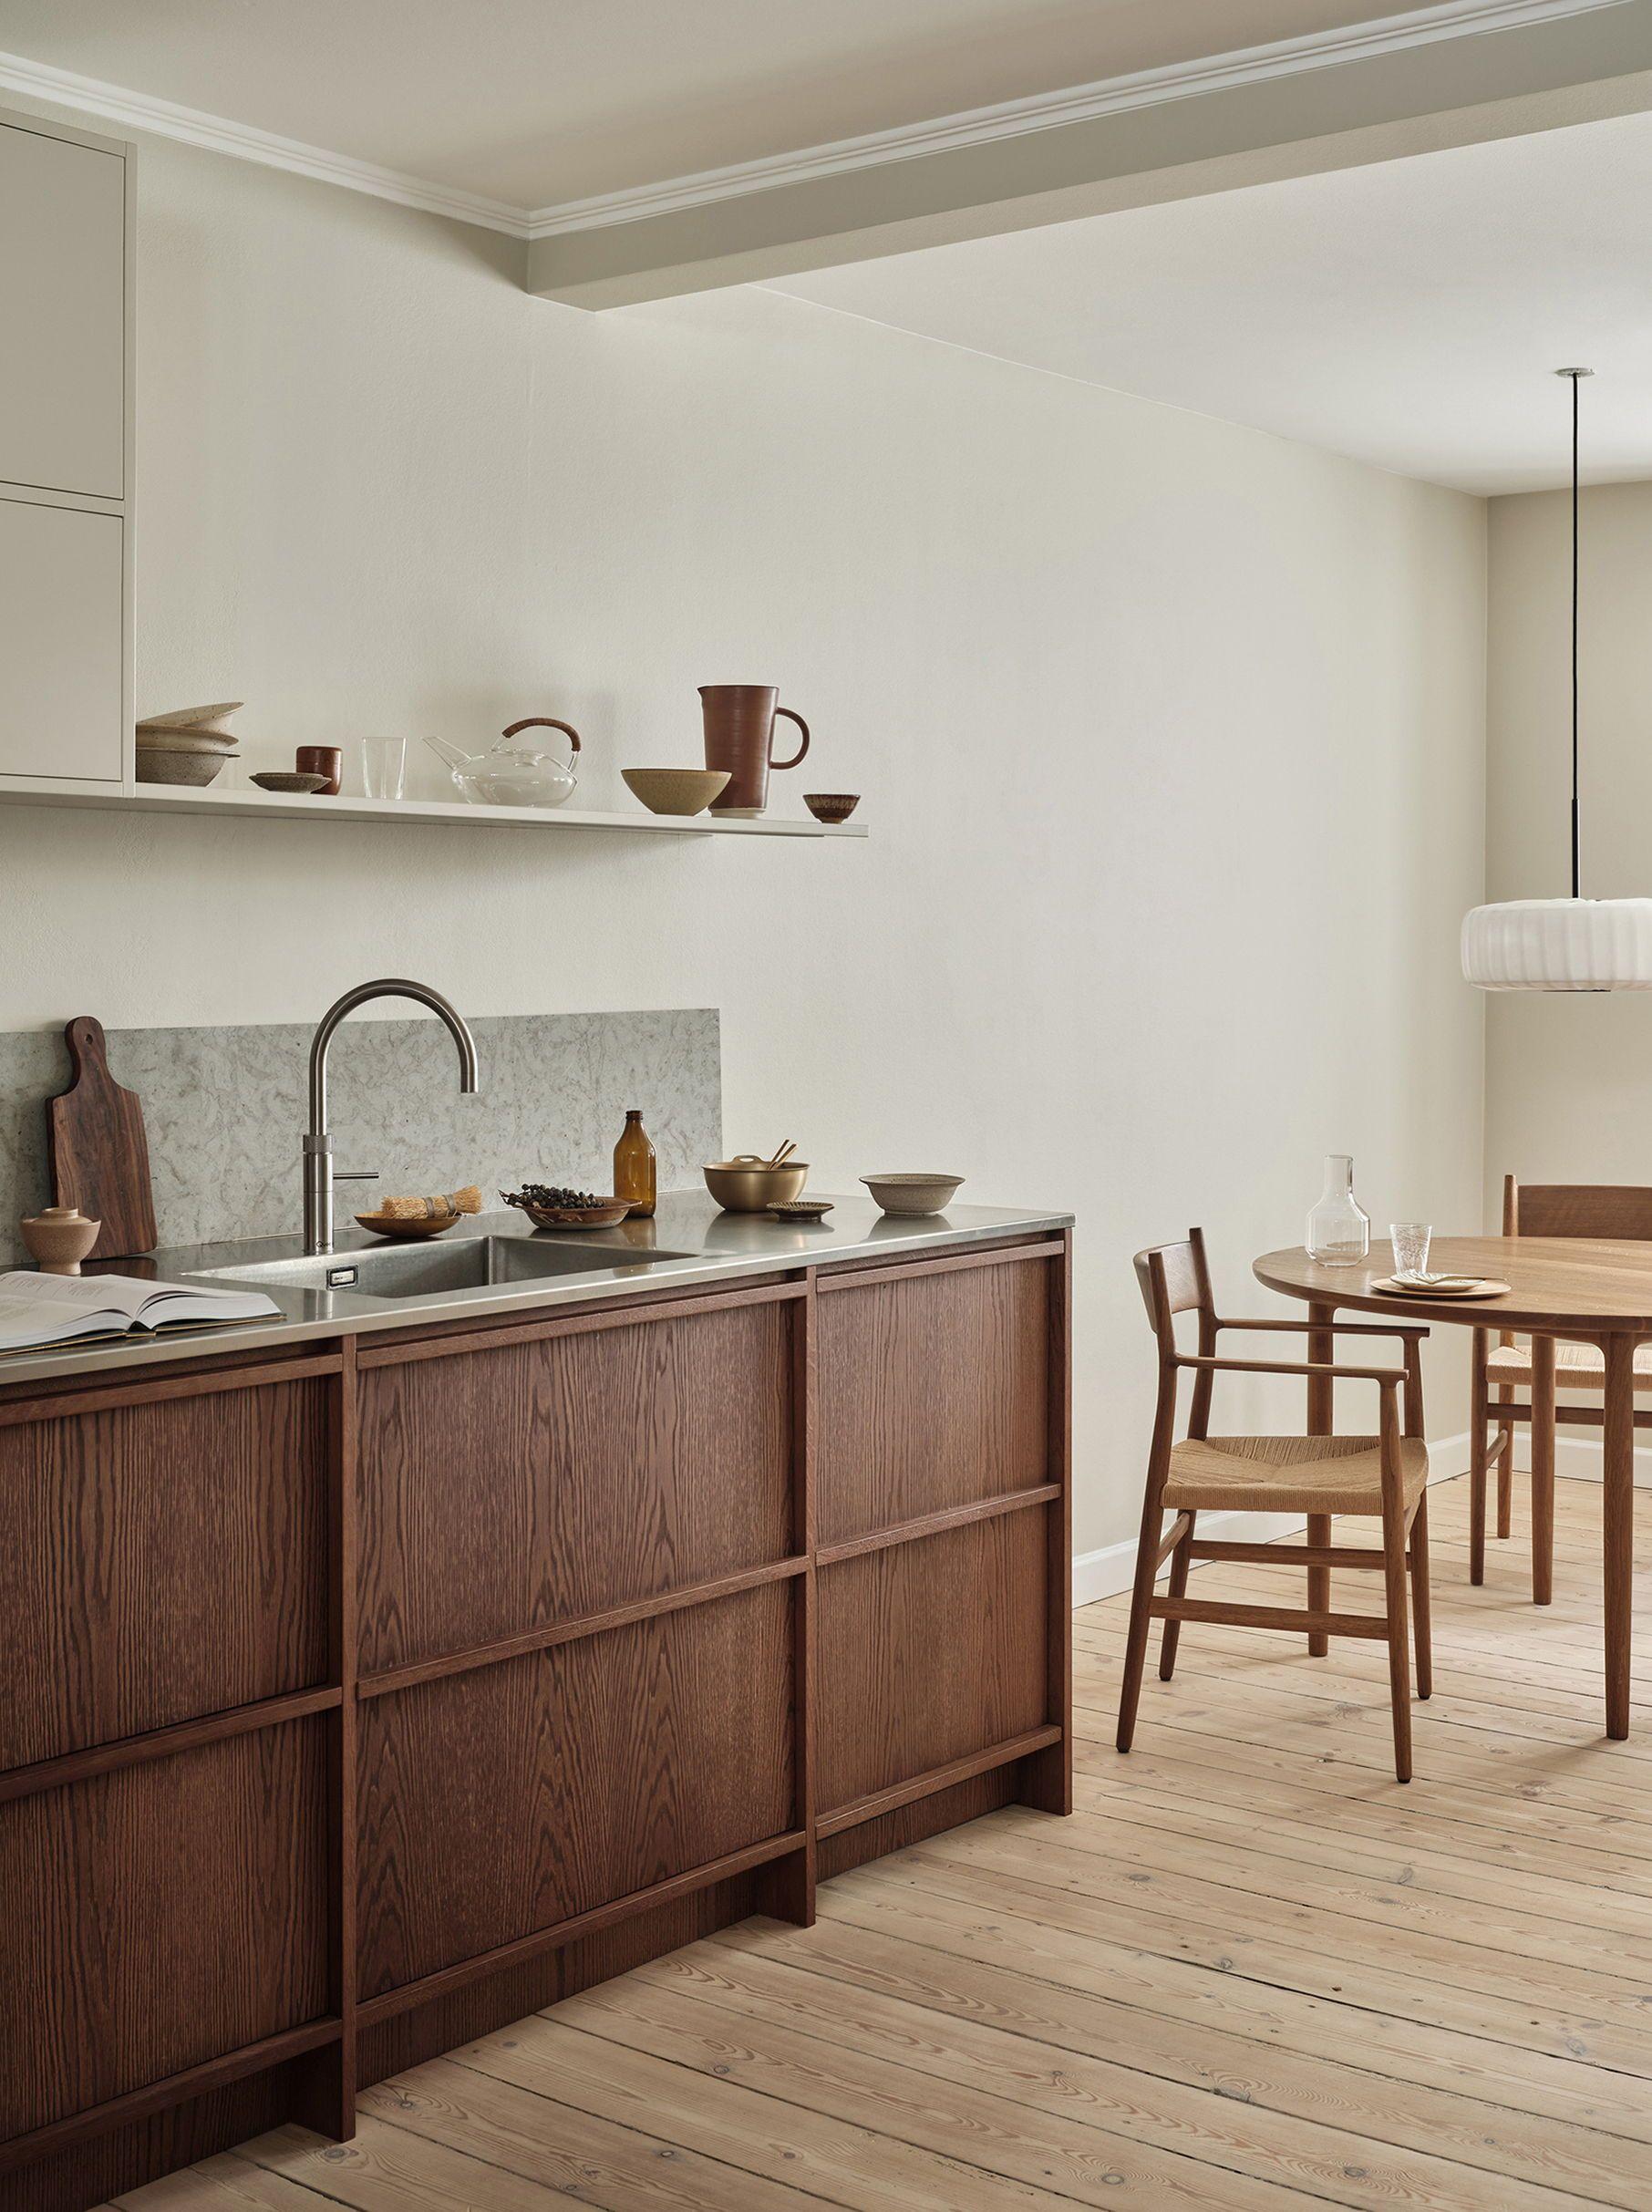 Dream Kitchen by Nordiska Kök - Table and chairs were designed by David Thulstrup for Noma restaurant. More kitchen inspiration, ideas, interior, countertops and design at @nordiskakok #noma #kitcheninspo #nordicdesign #scandinaviandesign #kitchen #davidthulstrup #woodenkitchen #kitchendesign #copenhagen #minimalist #nordicdesign #scandinavianhome #interiordesign #interior #minimalist #interiorarchitecture #kitcheninspo #scandinaviandesign #interiorinspiration #kitcheninspiration